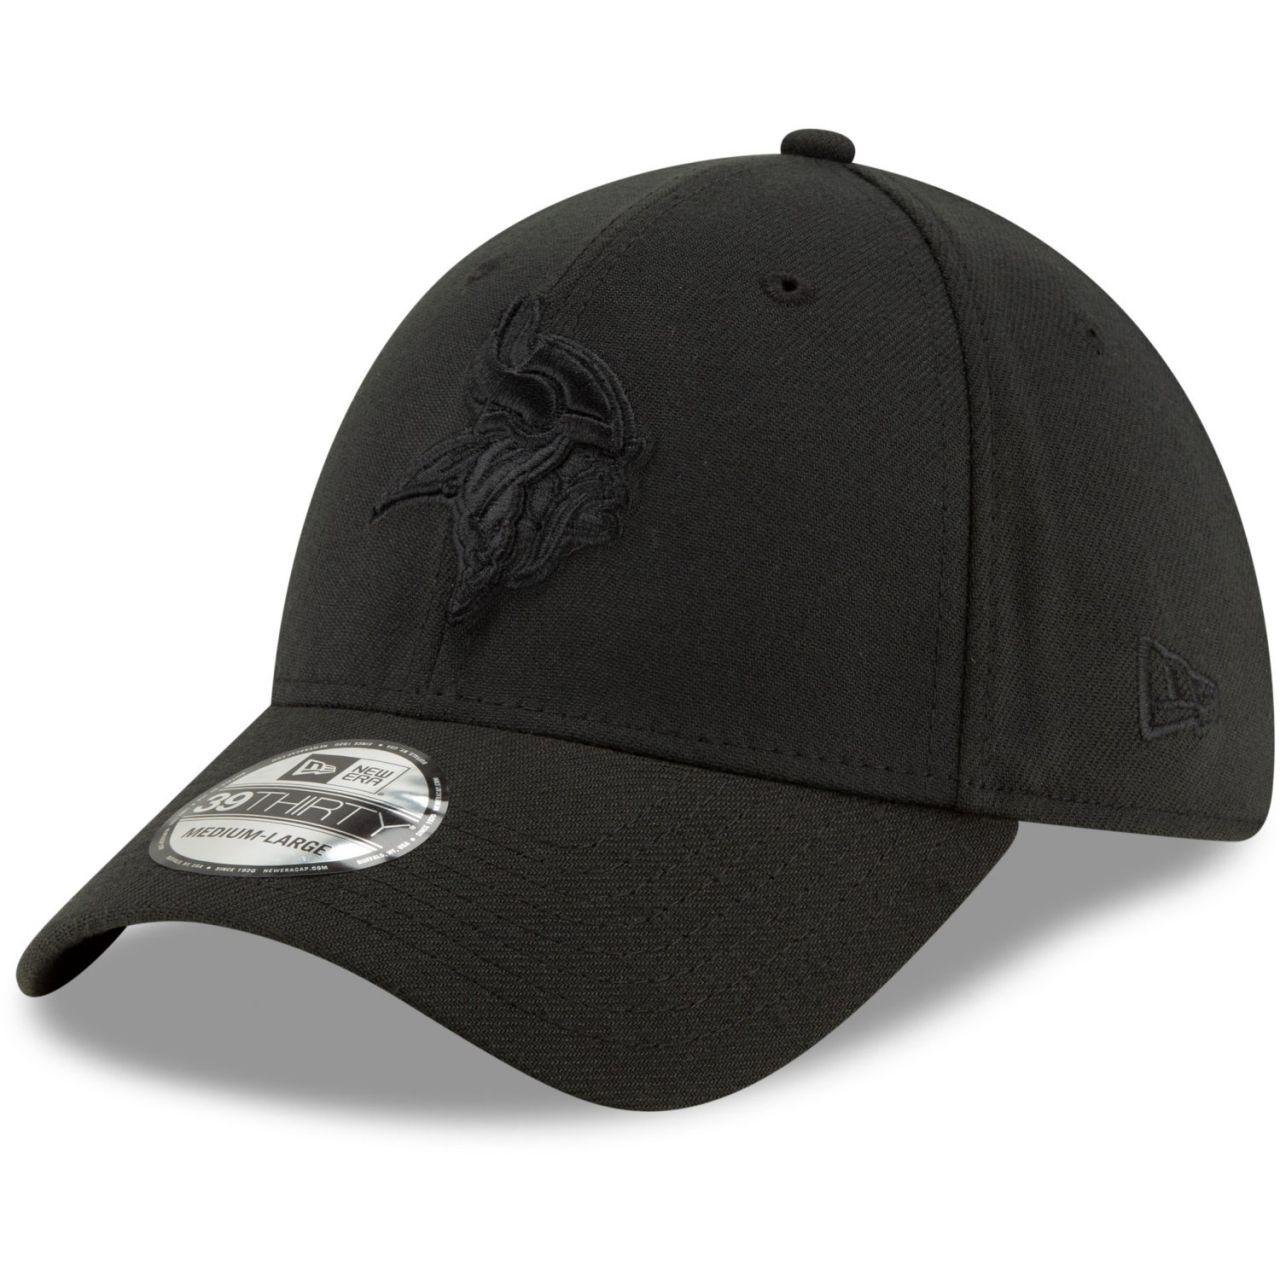 amfoo - New Era 39Thirty Stretch Cap - NFL Minnesota Vikings